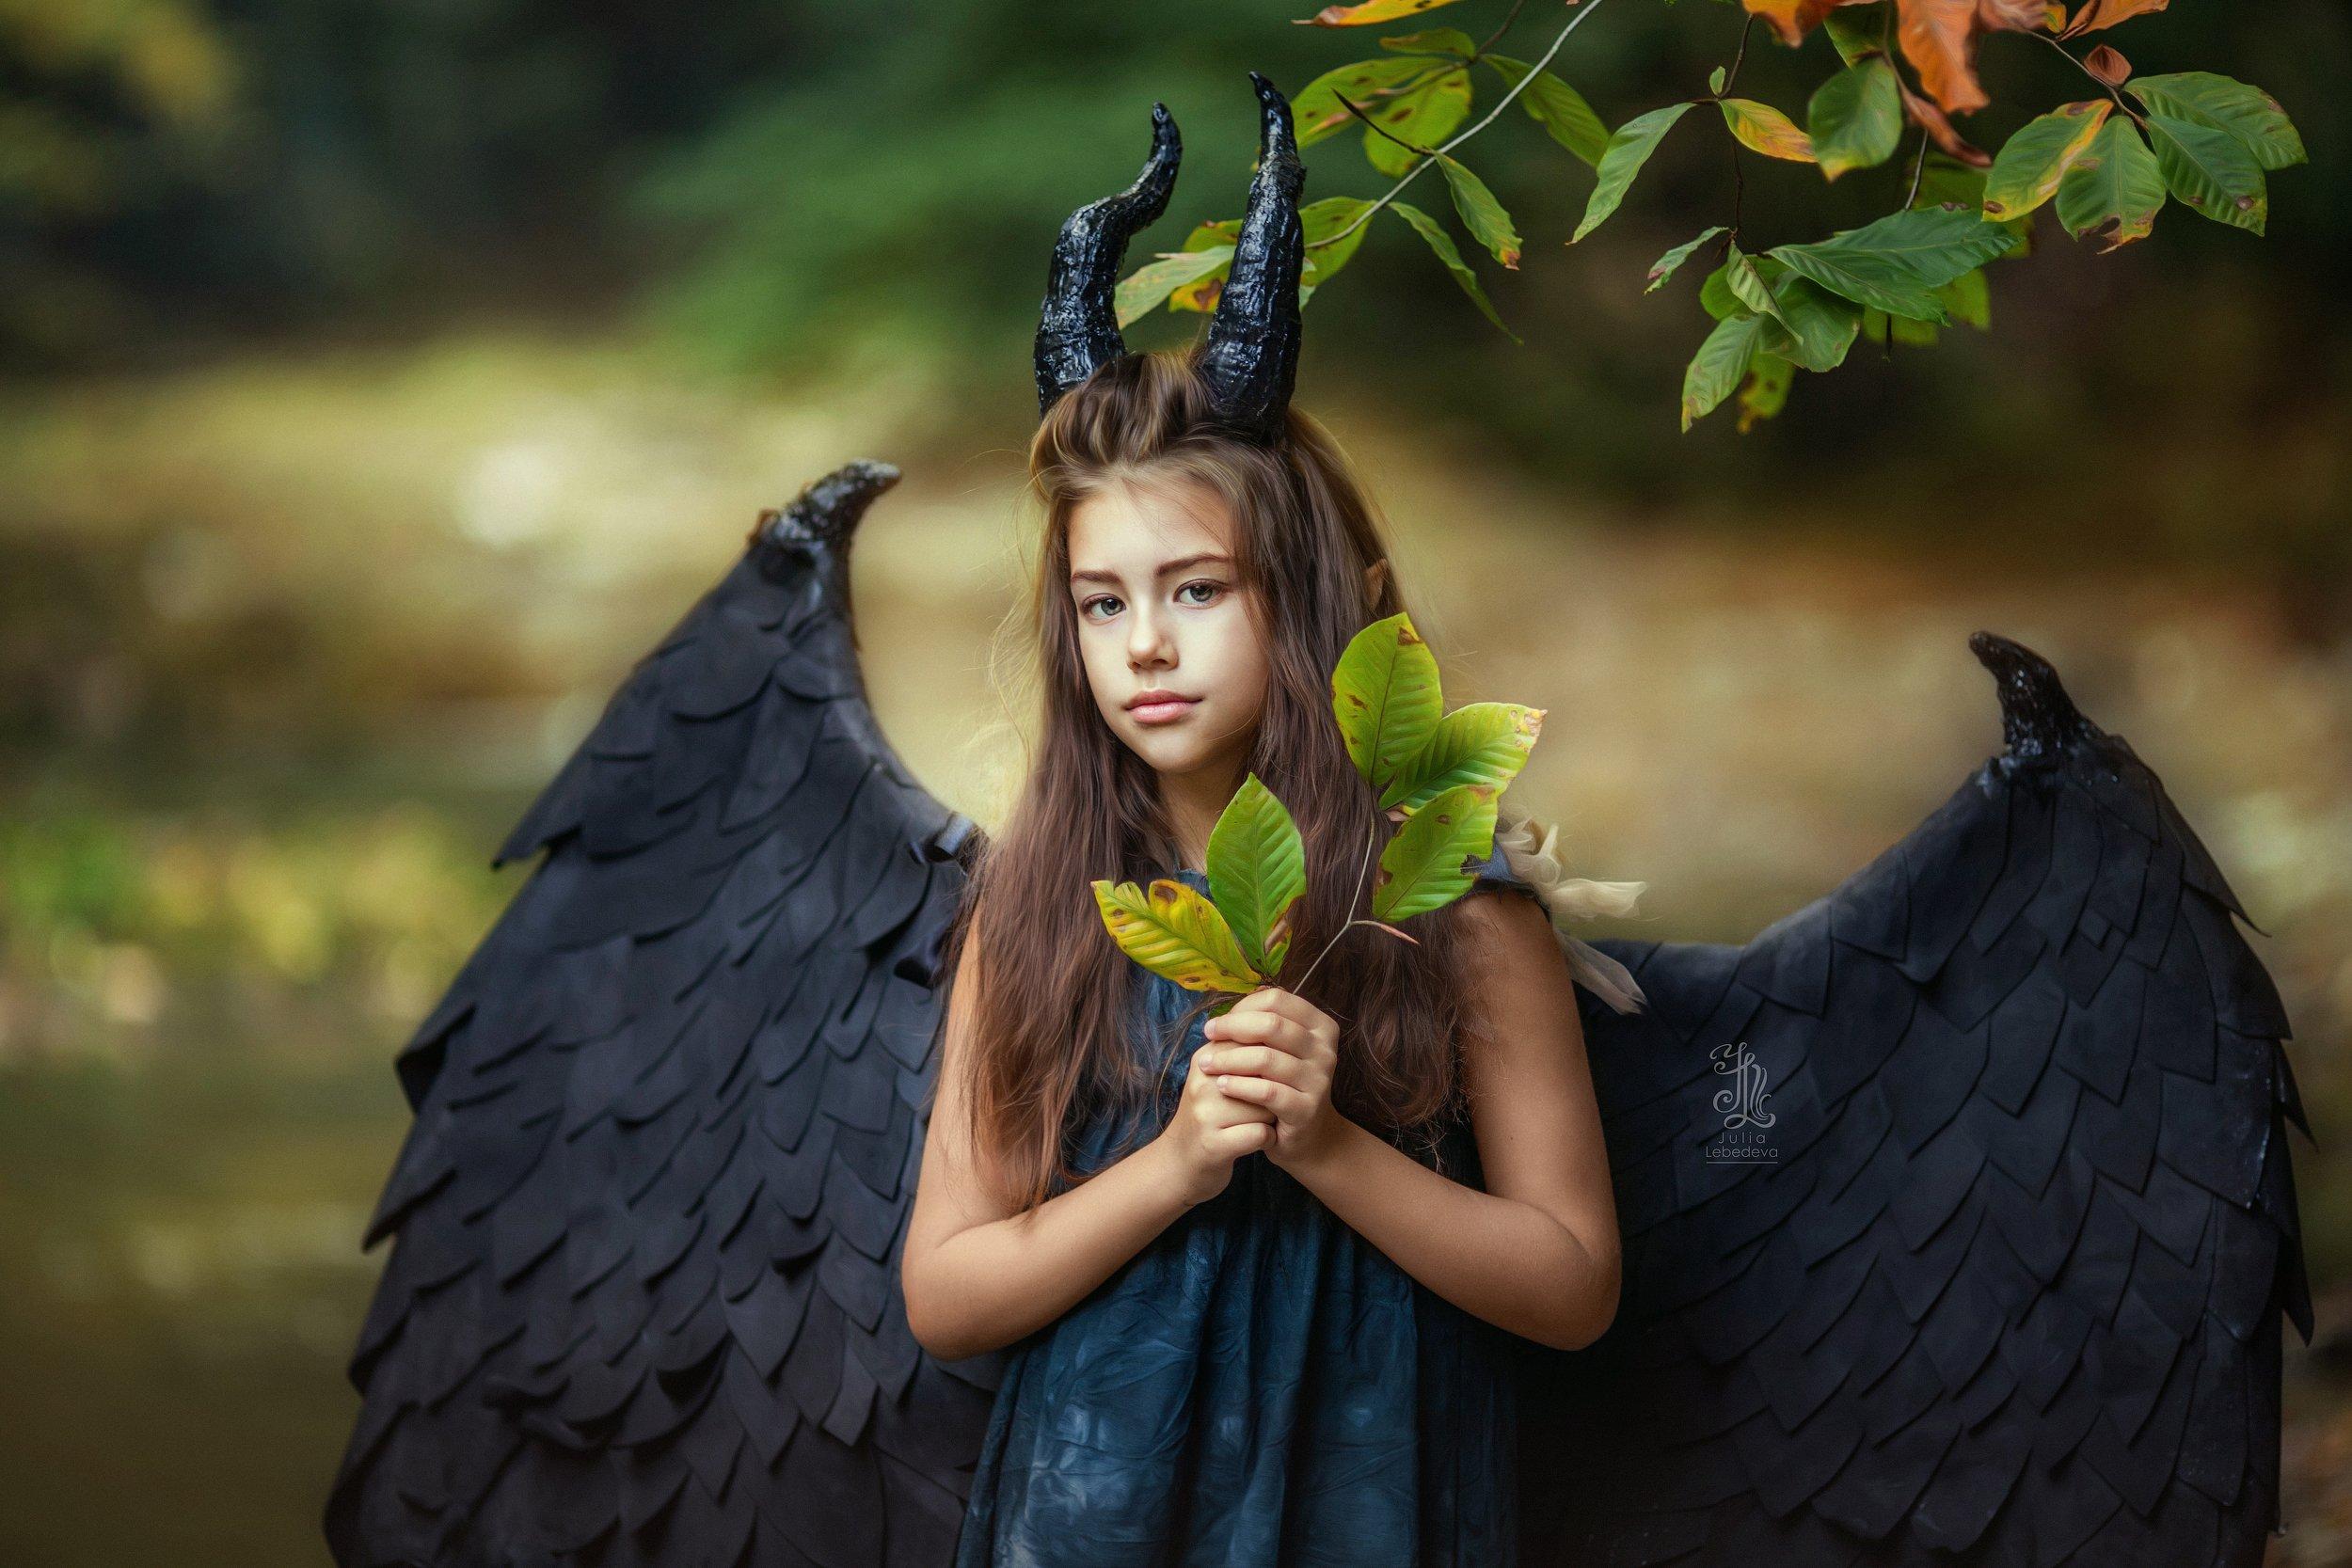 #girl, #portrait, #beauty, #lady, #135mm, #pretty, Лебедева Юлия